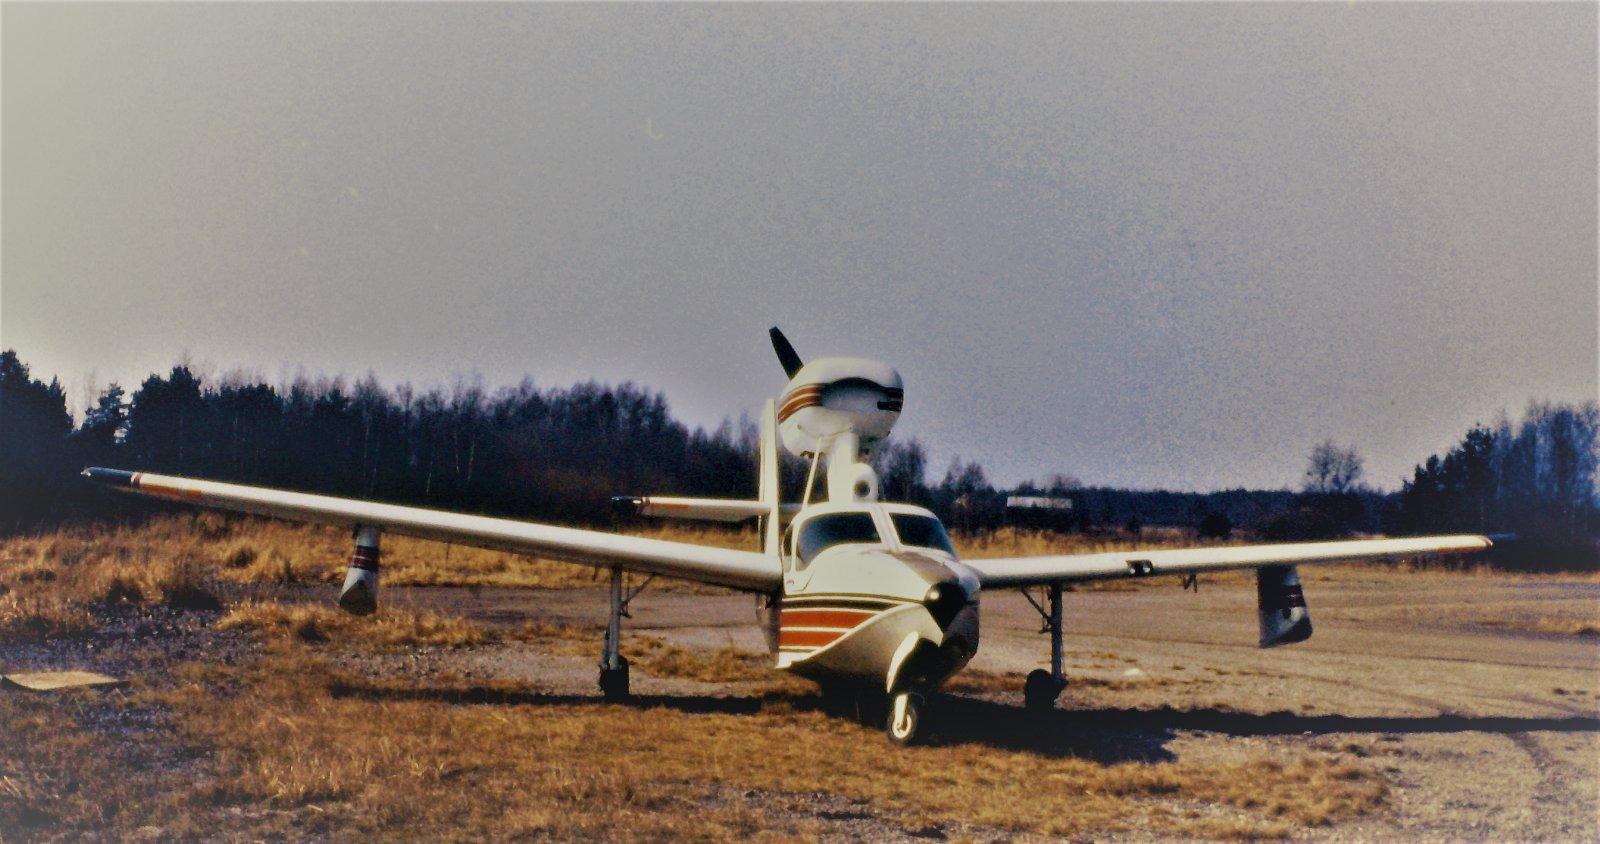 Lake LA-4-200 Buccaneer OH-AKI EFHN 1989